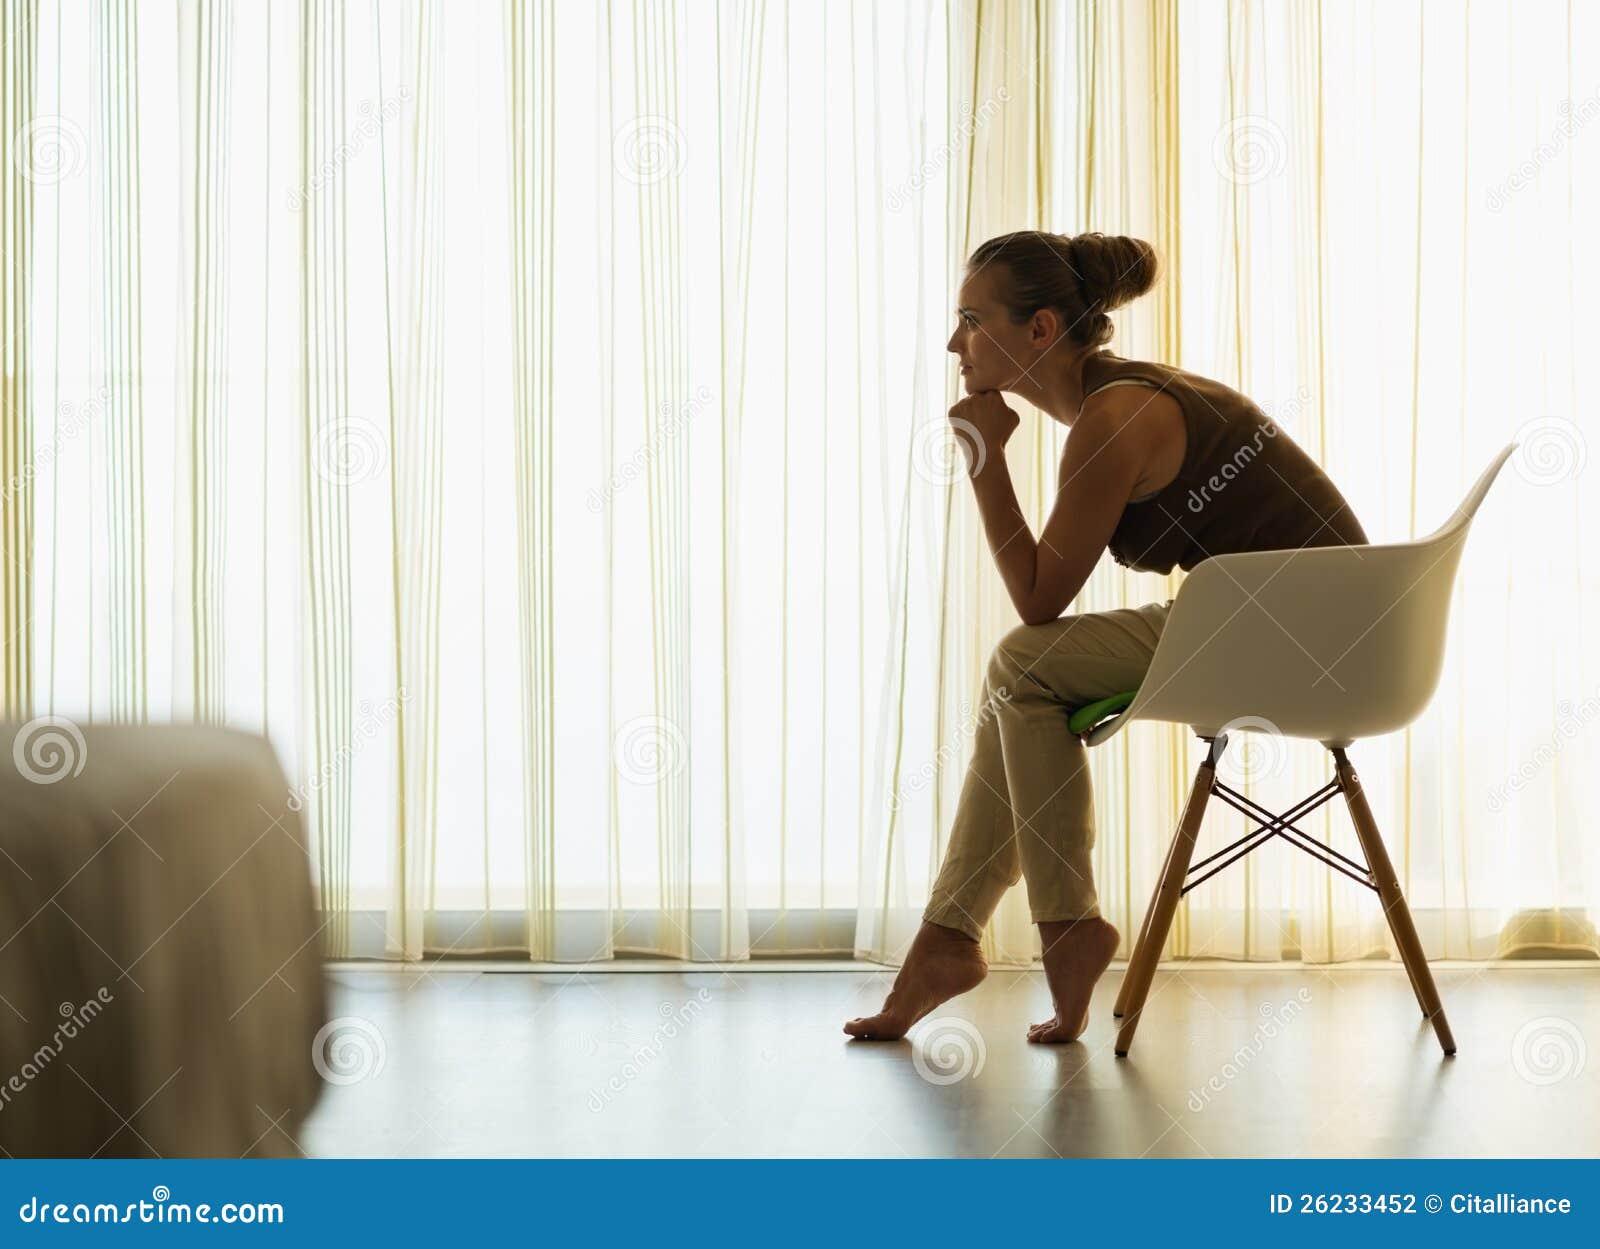 Female Sitting Near Window In Thoughtful Pose Stock